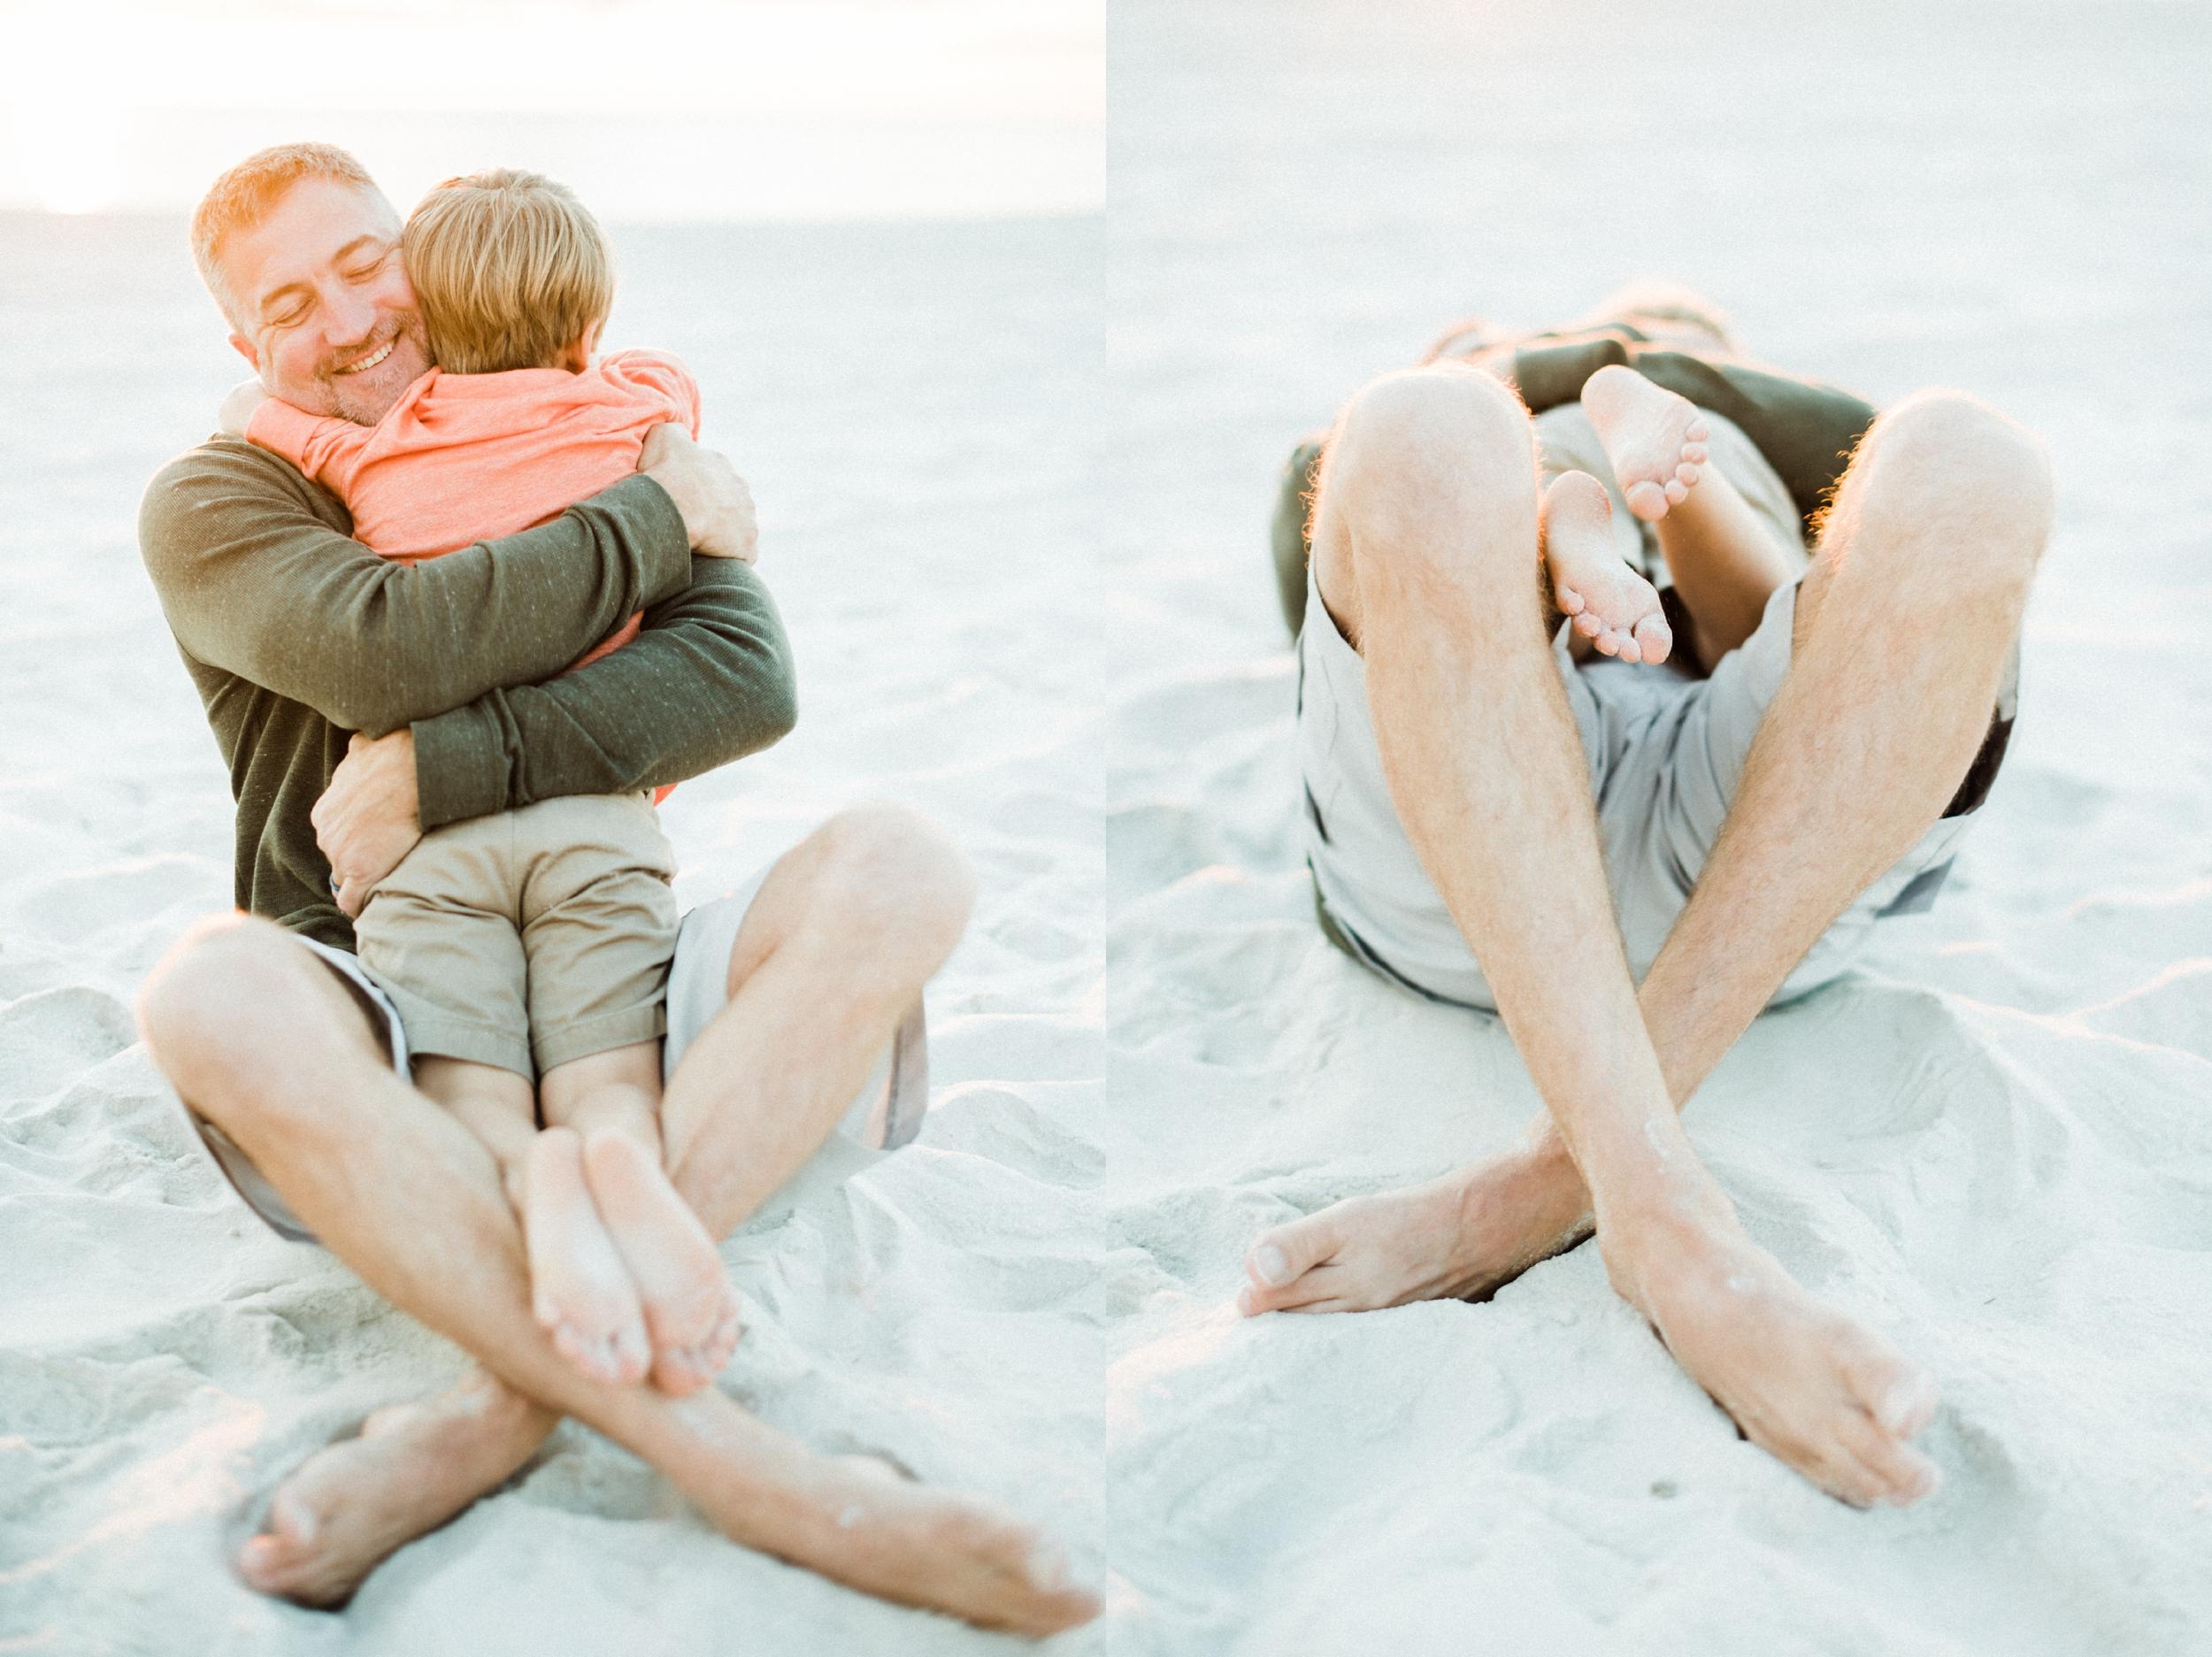 desiree-gardner-photography-pairs-france-monet-garden-monets-couple-wedding-engagement-giverny-30-a-30a-florida_0078.jpg